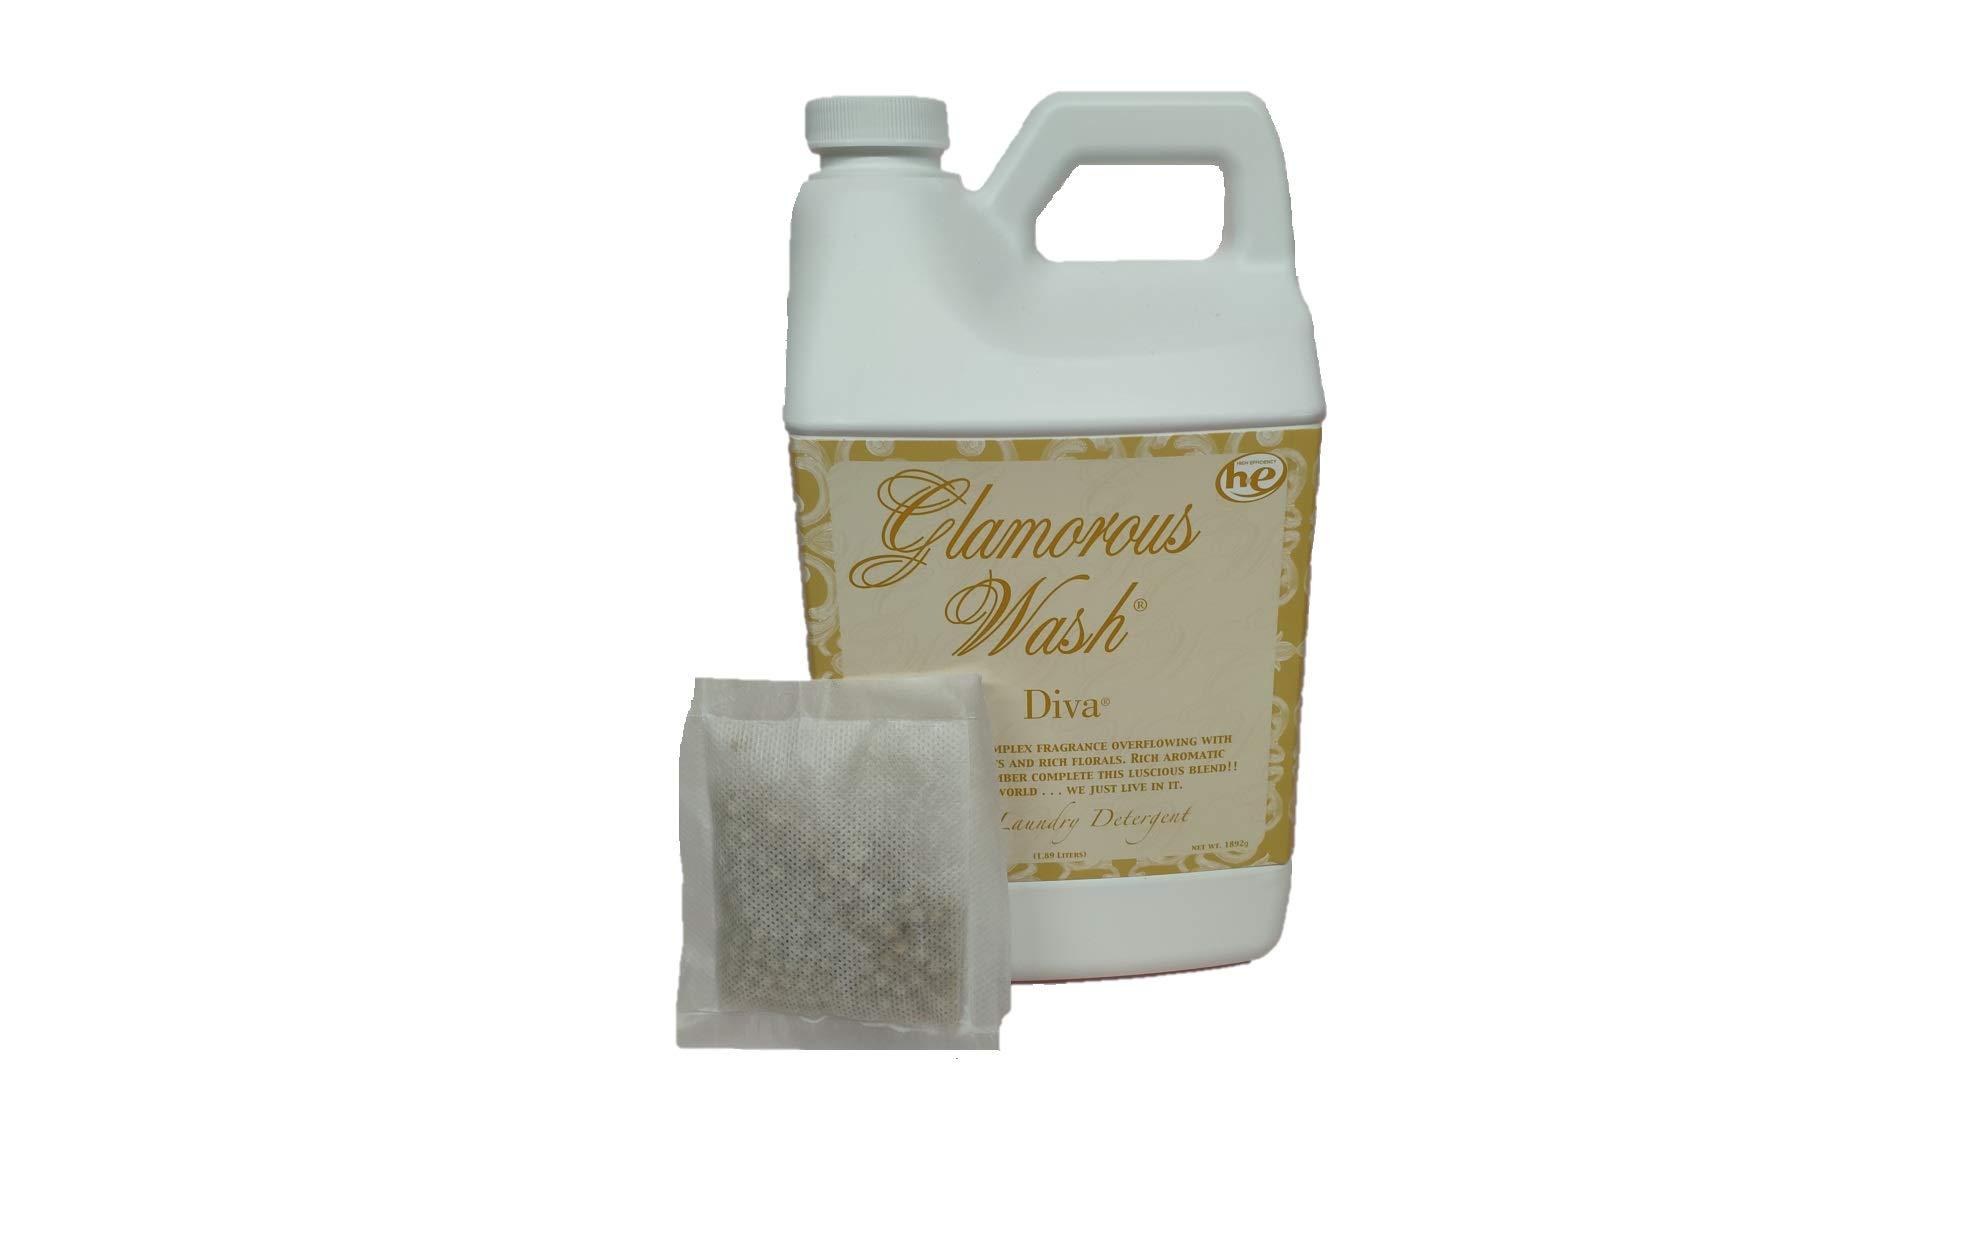 Tyler Candle Glamorous Wash Diva Half Gallon (64 OZ) Laundry Detergent/with Bonus Glamorous Sachet Single Pouch